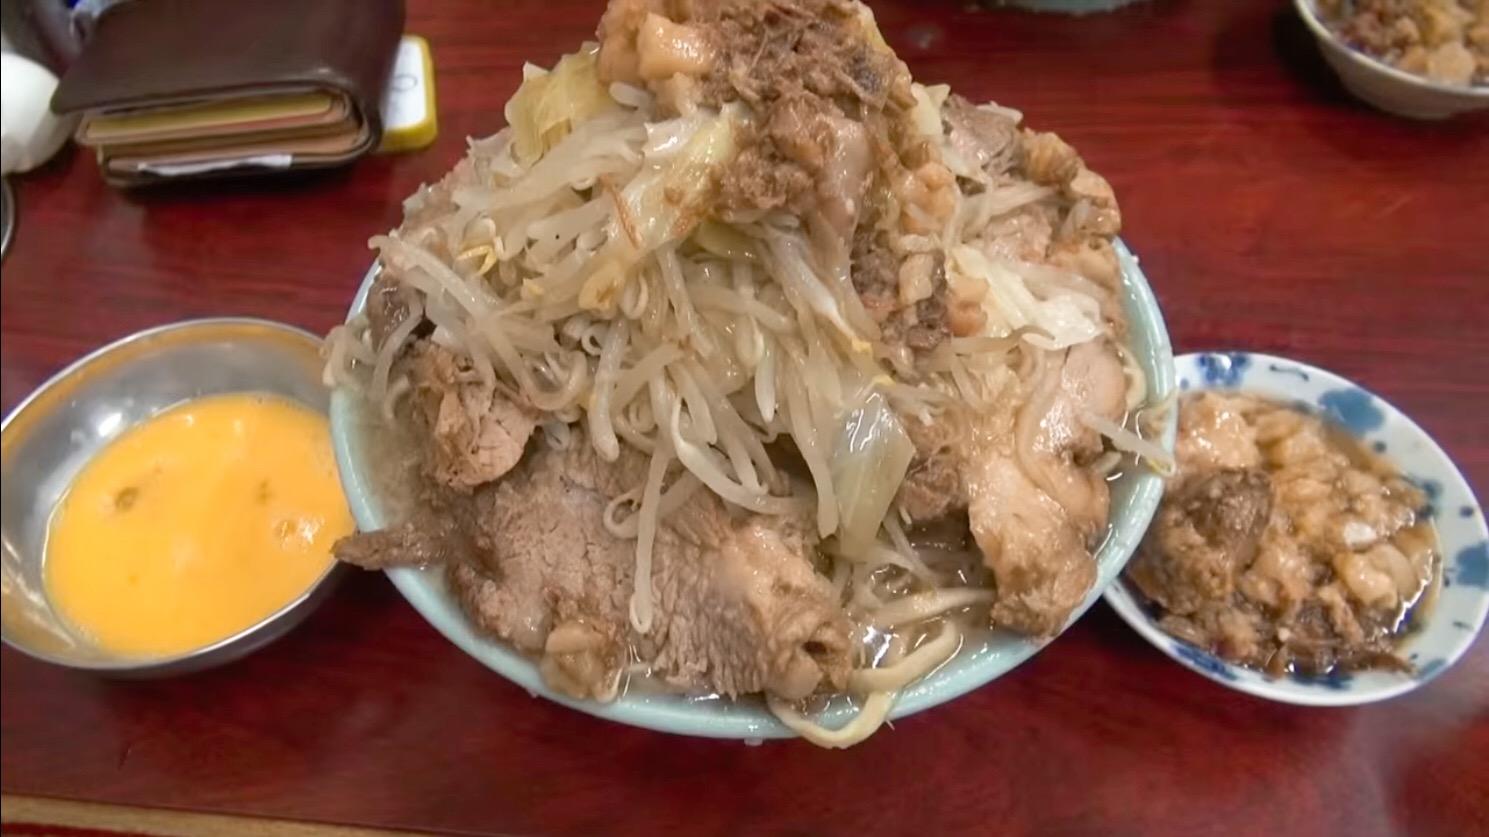 【ラーメン富士丸 神谷本店】国産ブタメン+生卵 (東京都北区神谷) 第49回